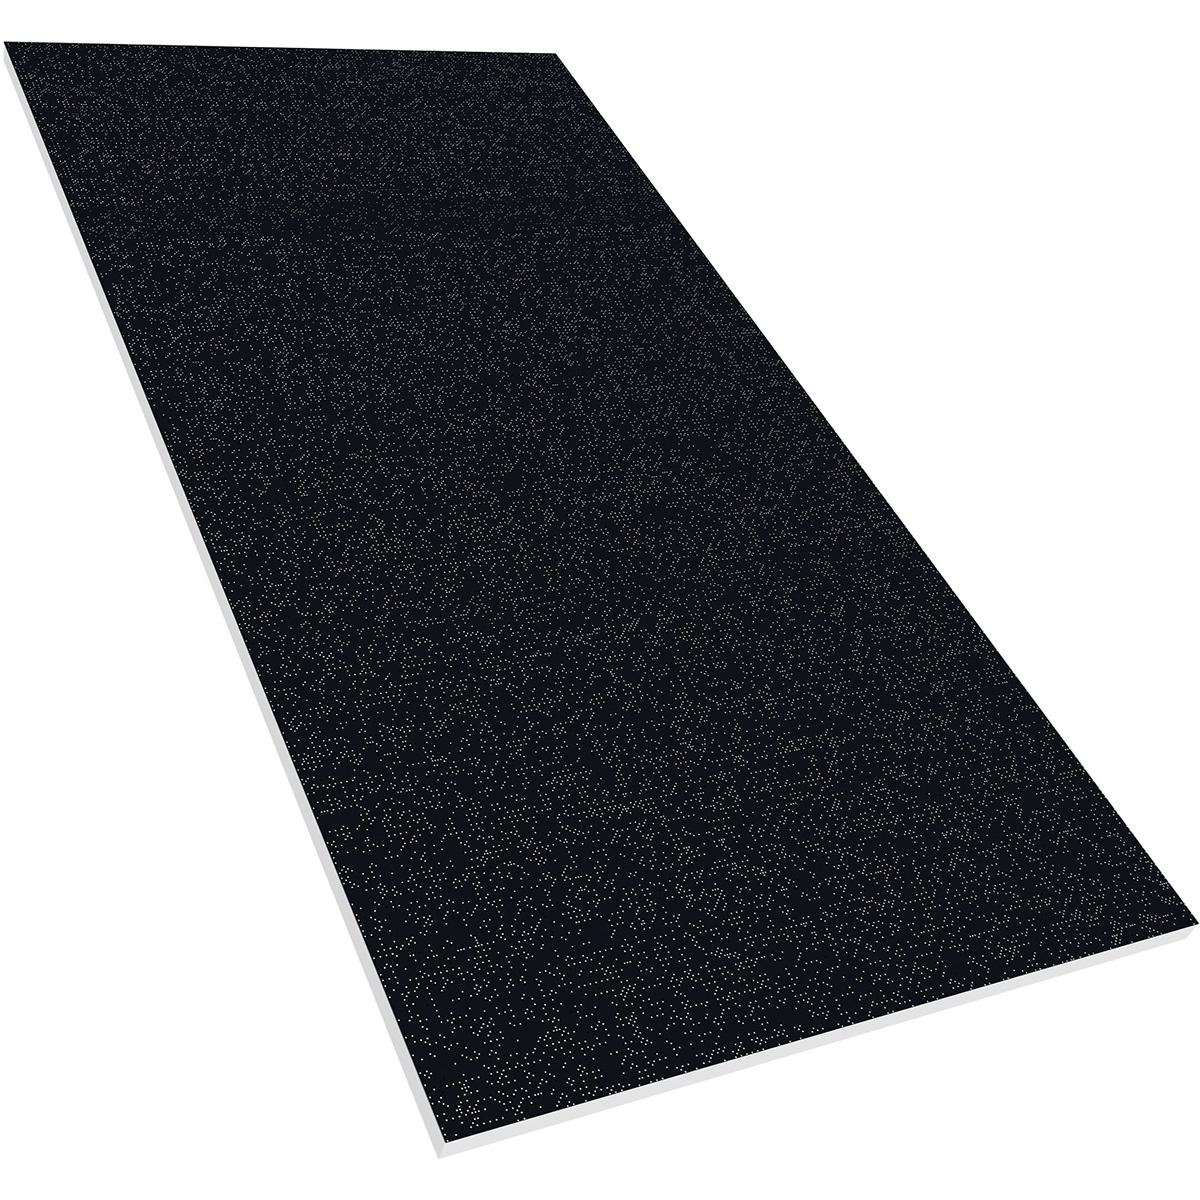 Ecler Noise2-1202A - Акустическая панель 1200х600х20 мм, черная